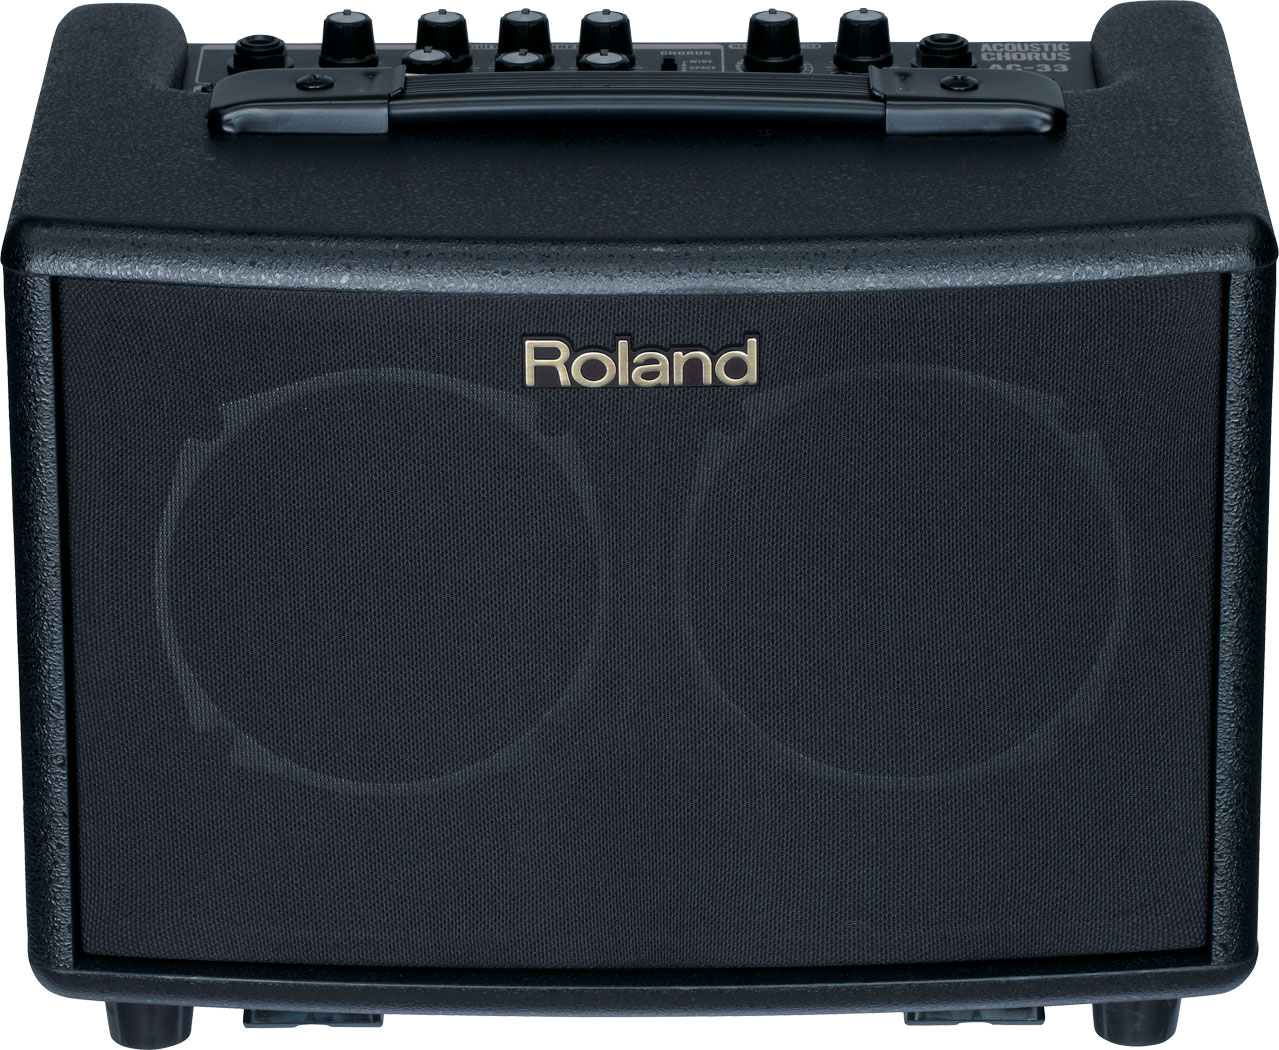 Roland Ac 33 Acoustic Chorus Guitar Amplifier Sonic Gear Quatro 2 Portable 20 Speaker